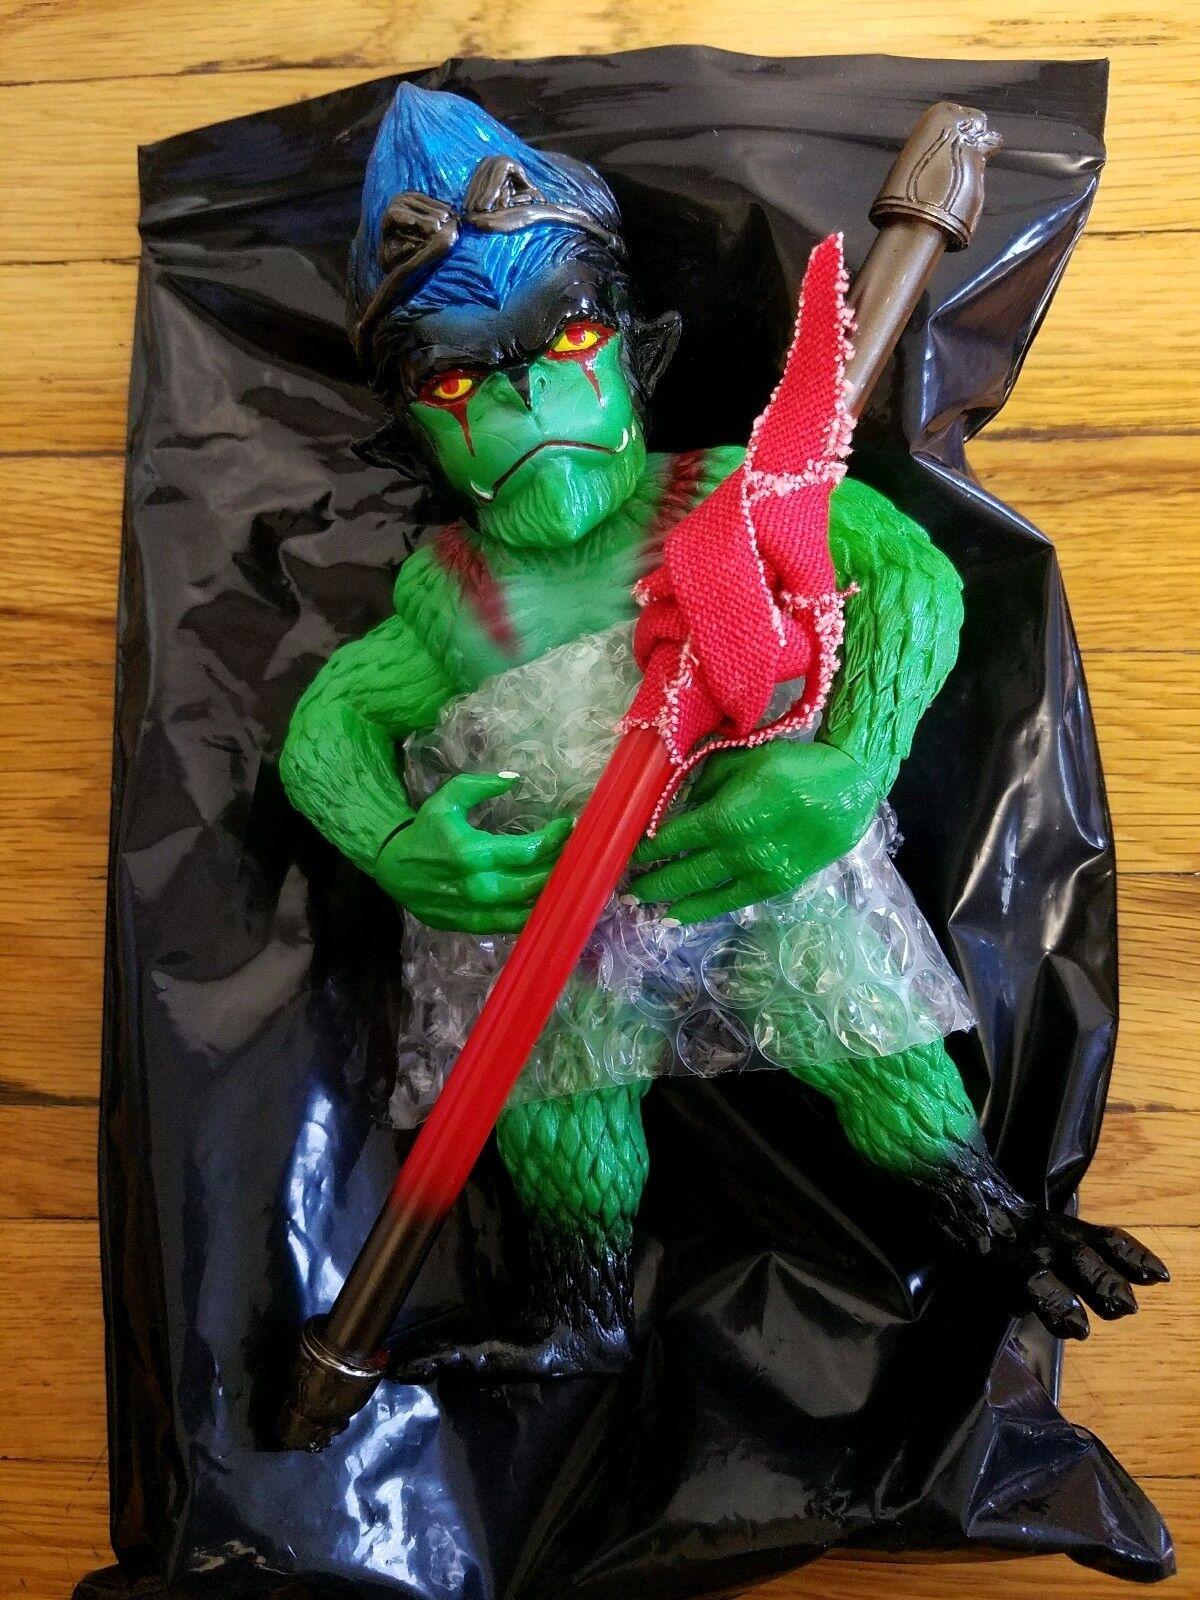 MythToys Monkey King Devilman Sofubi Kaiju Japan HxS paul mvh bemon myth toys